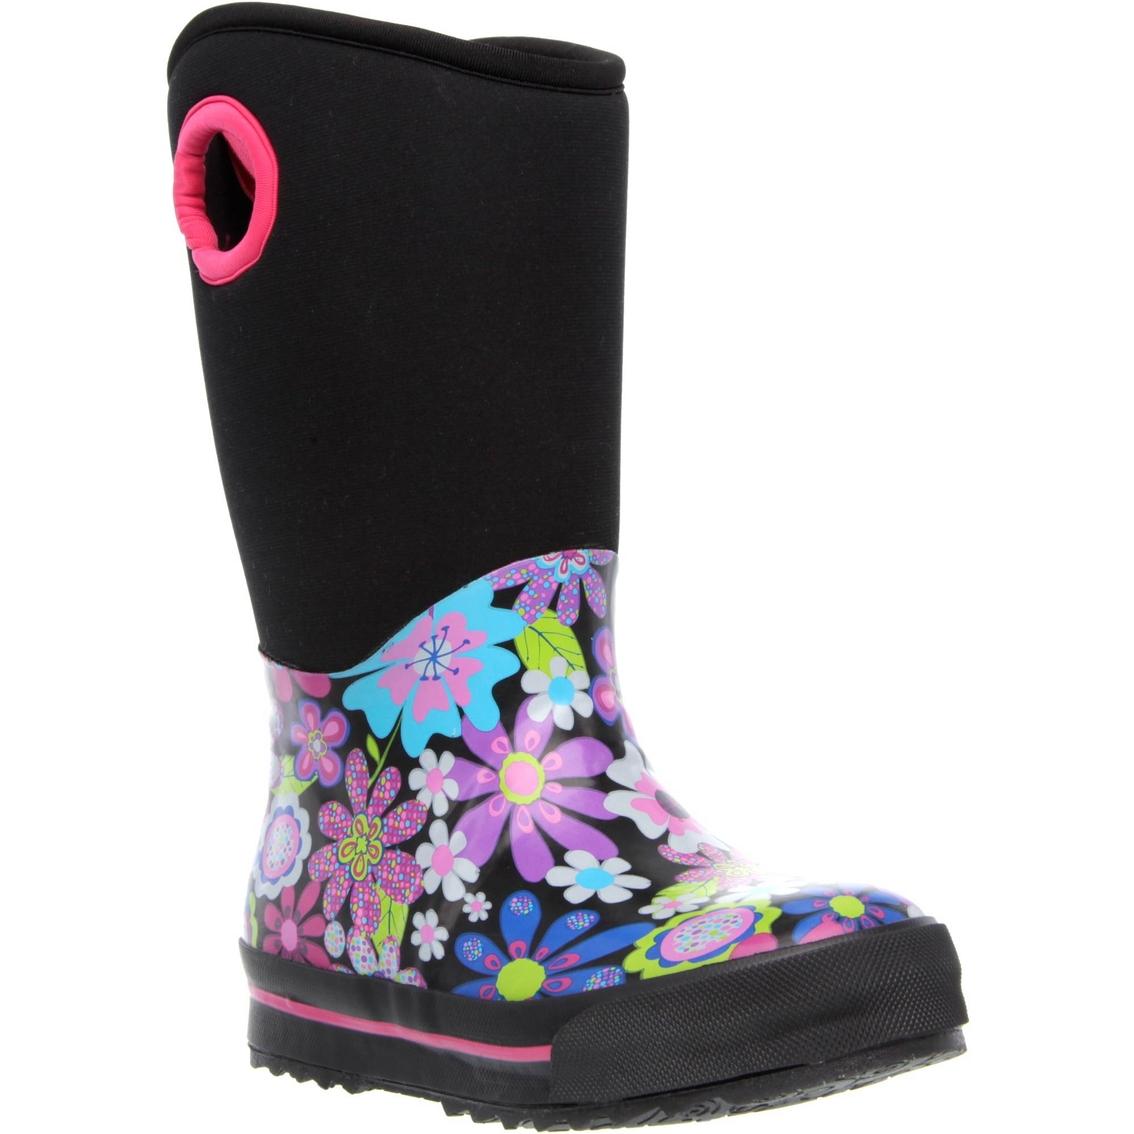 skechers girls boots